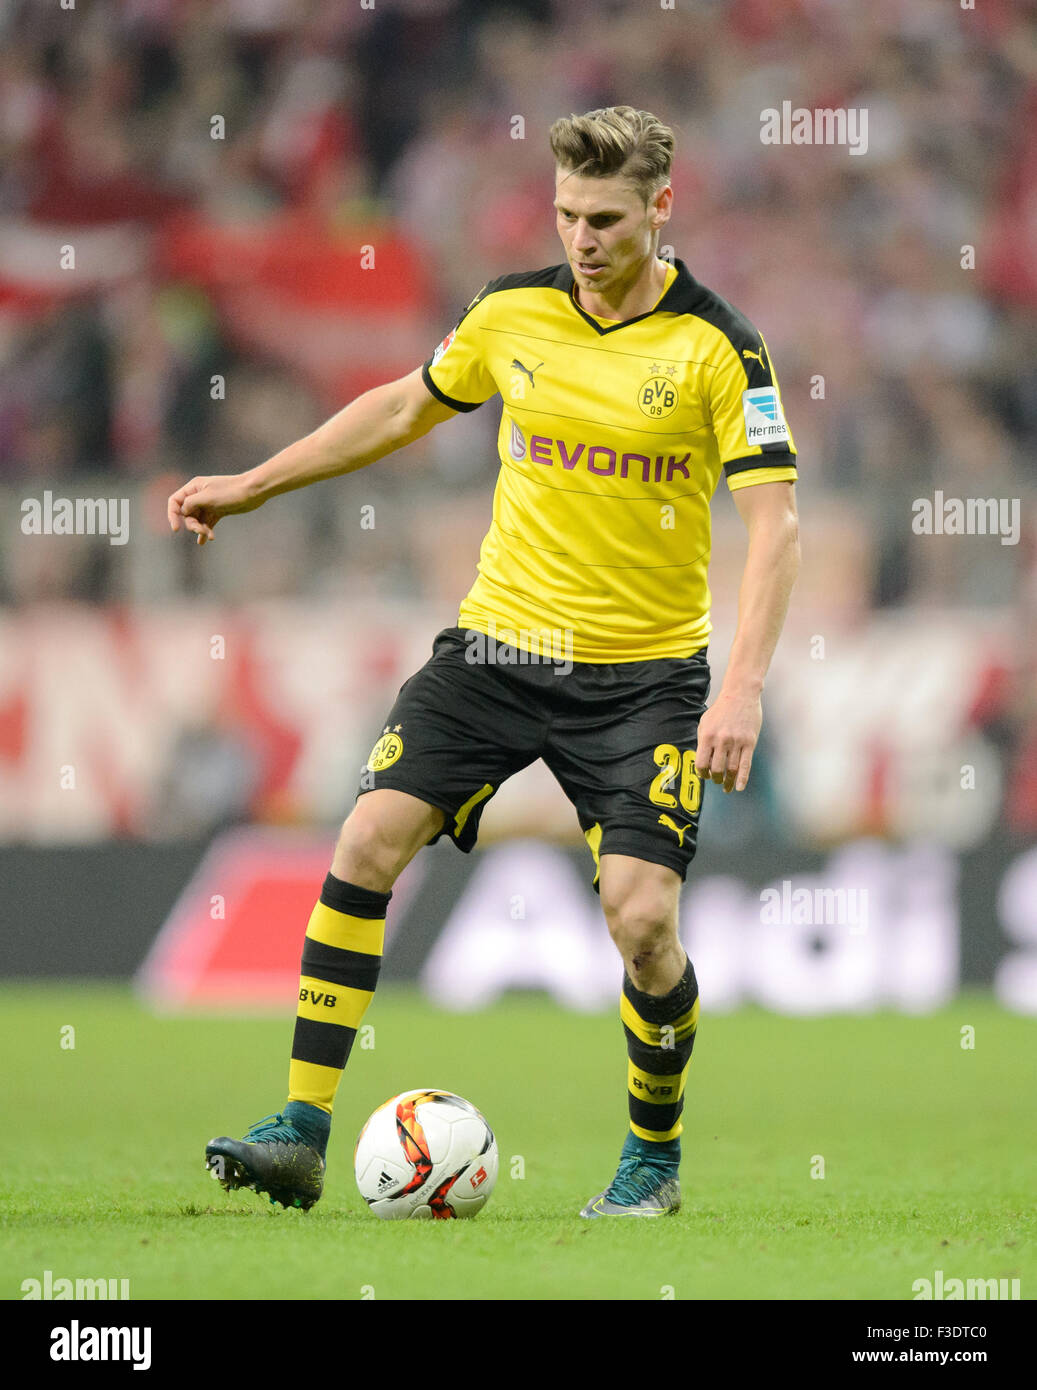 Munich Germany 4th Oct 2015 Dortmunds s Lukasz Piszczek in